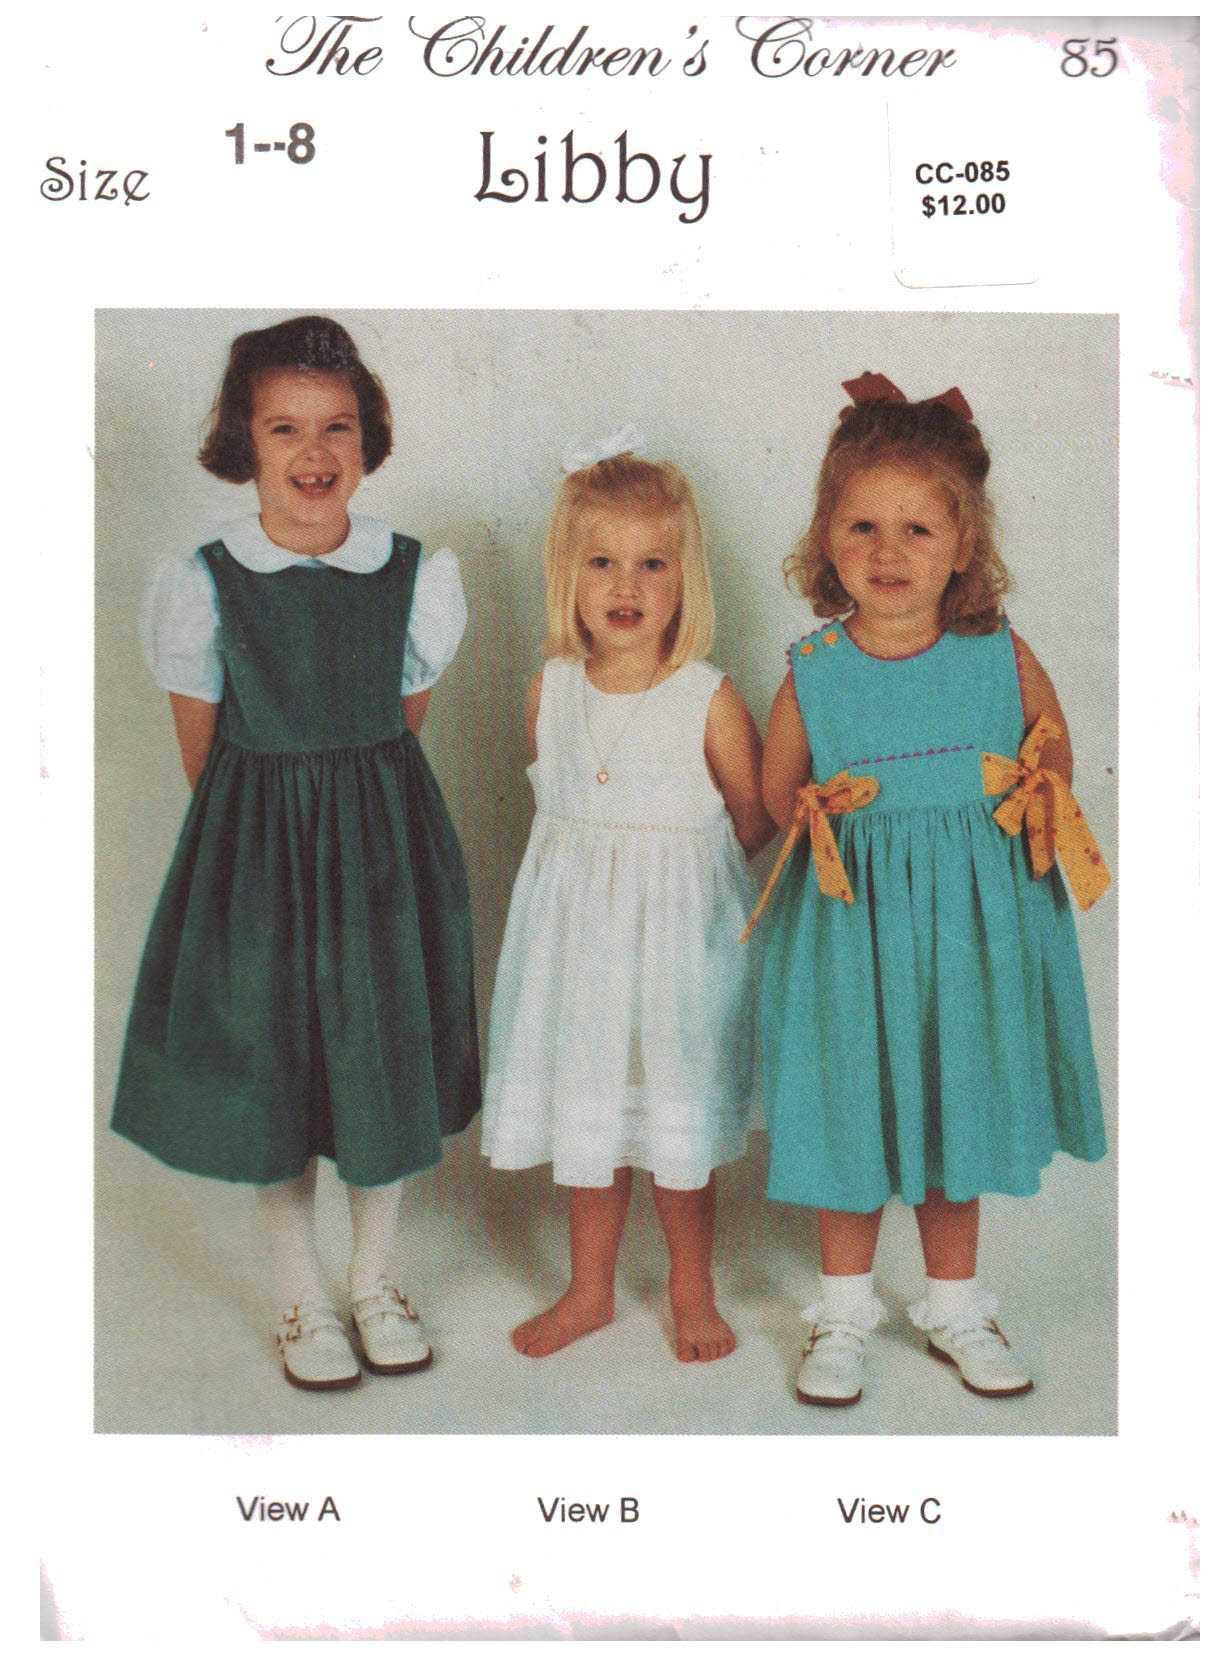 fa3f14563 Sewing Patterns - Pattern-Walk The Children's Corner sewing patterns